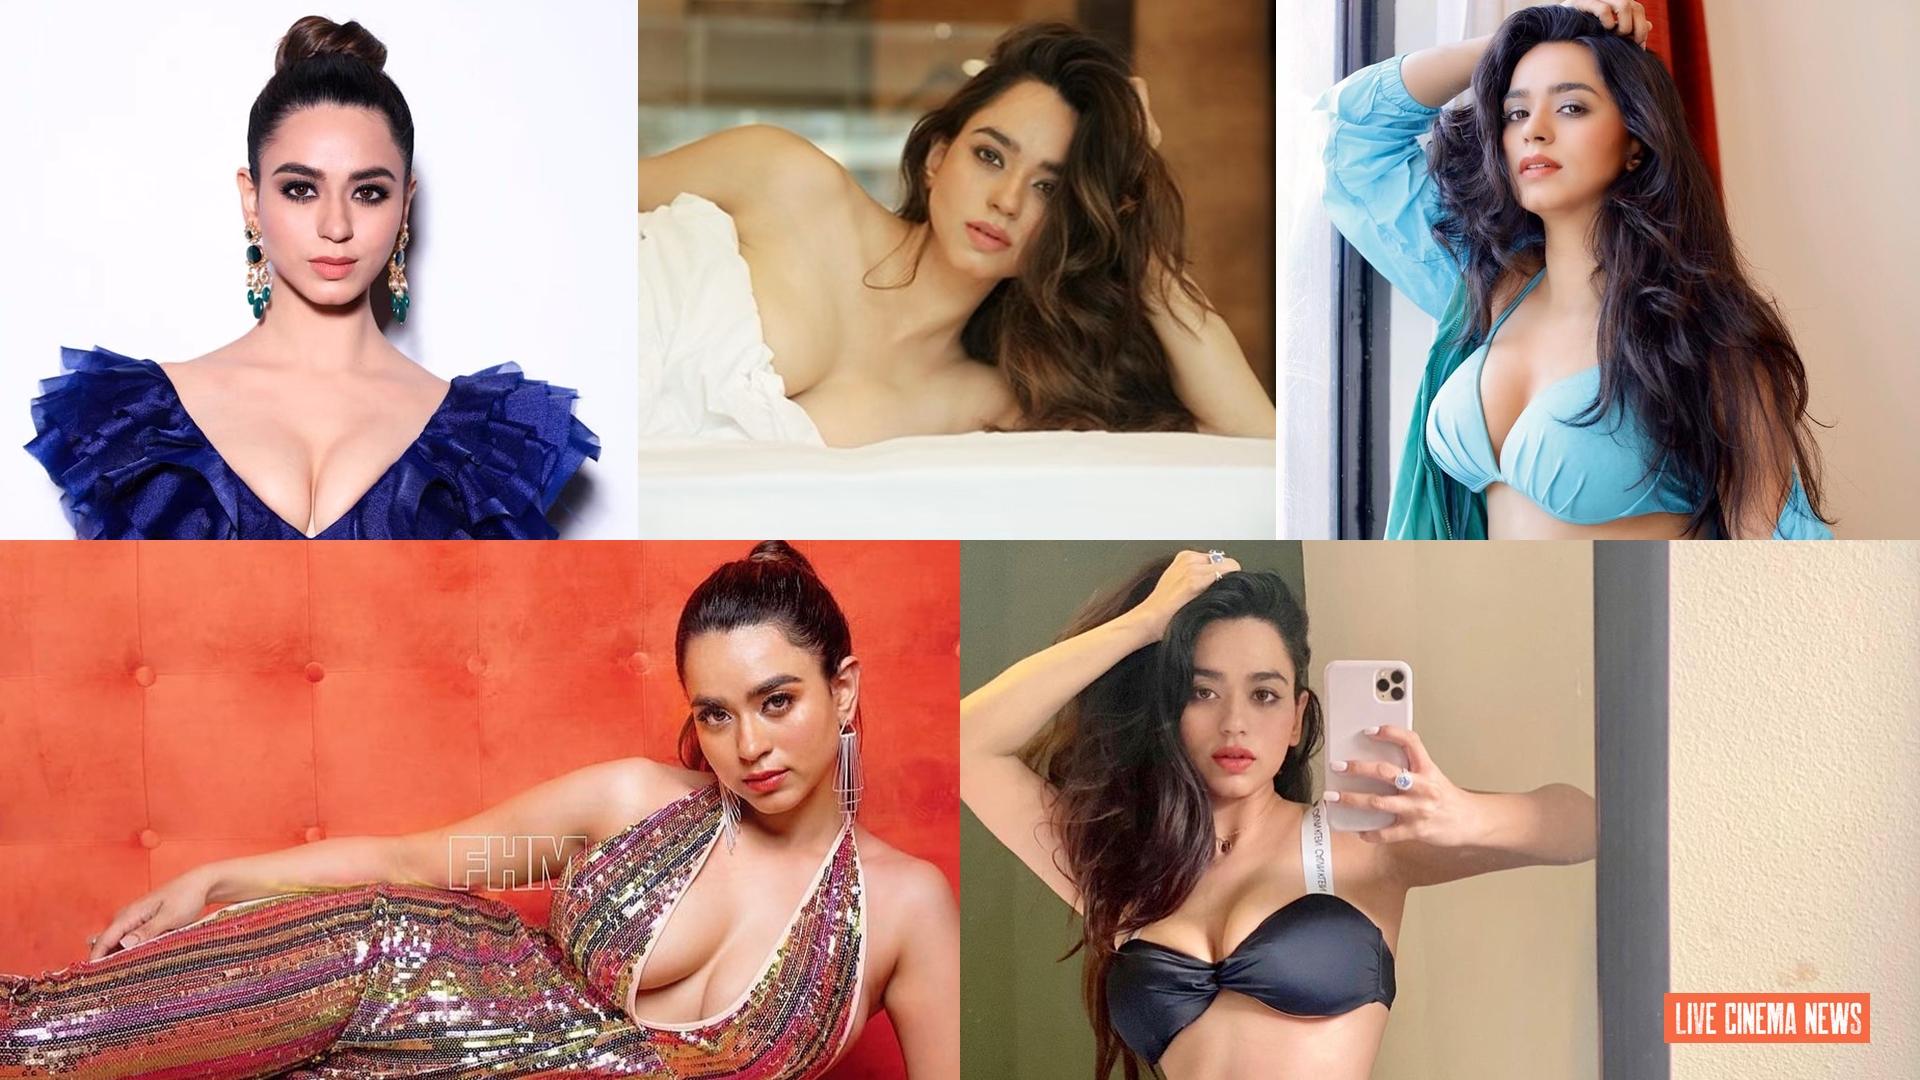 Beauty Queen Soundarya Sharma Photos